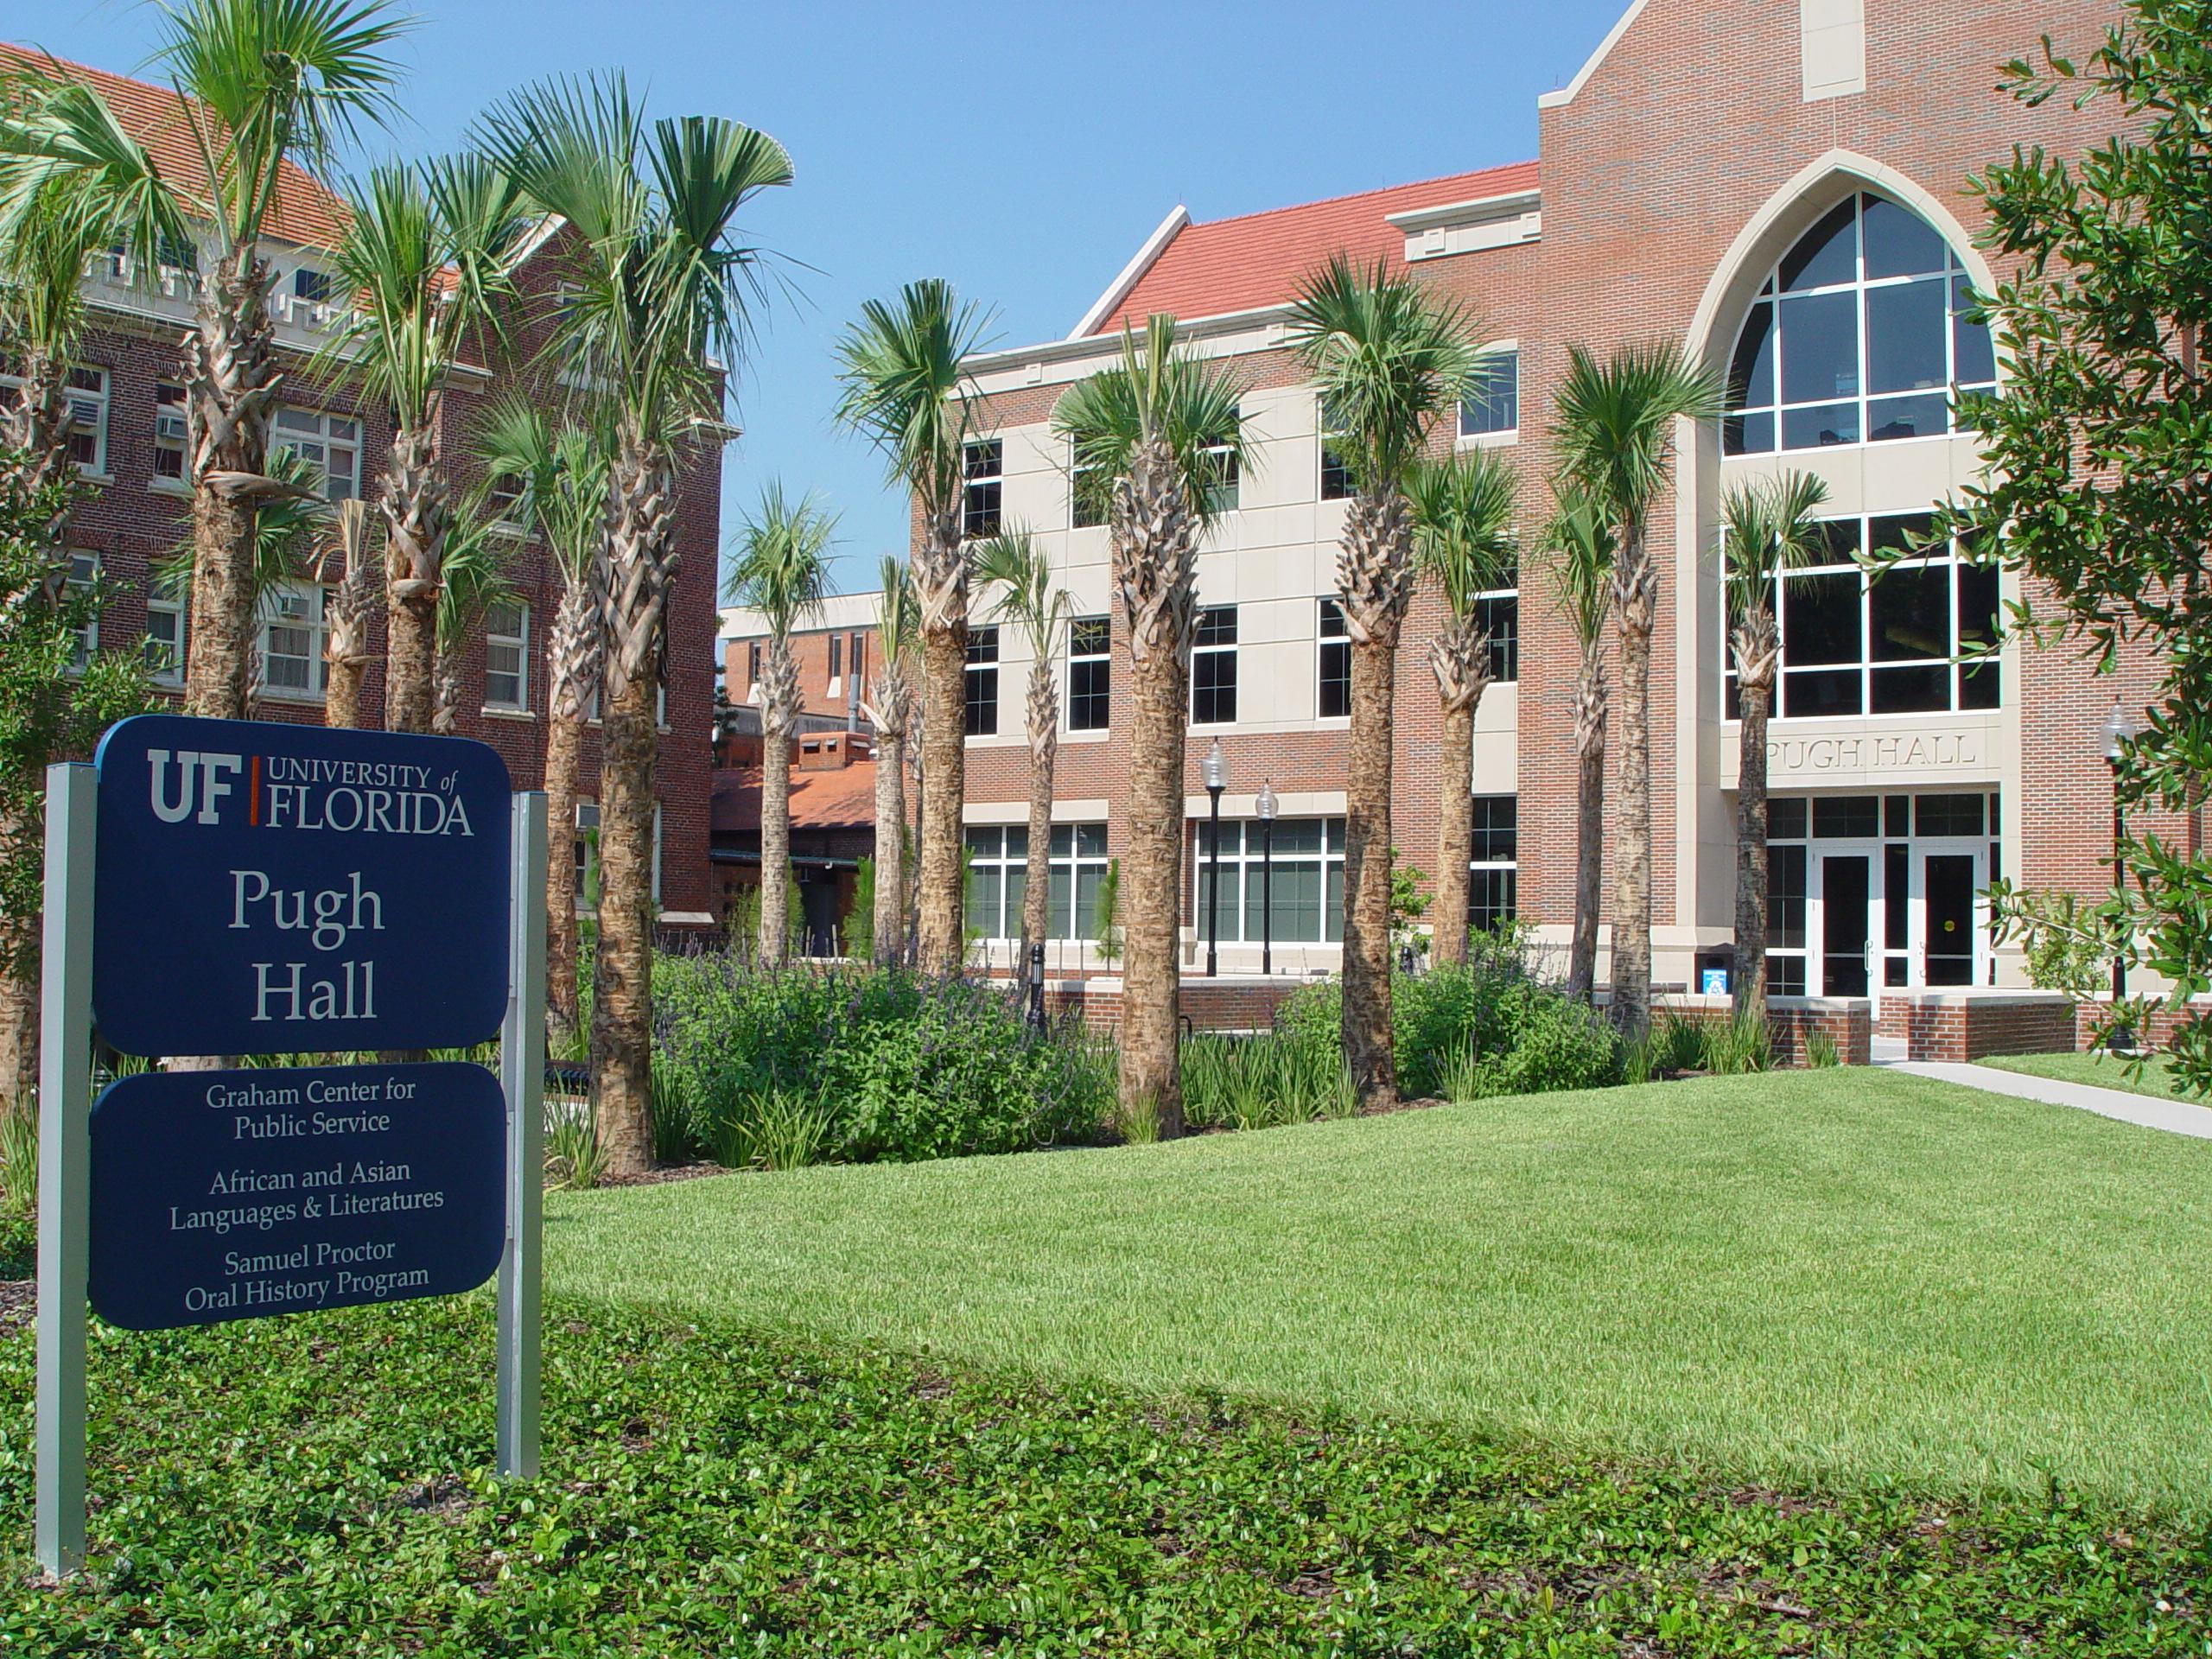 Uf Pugh Hall Room Reservations